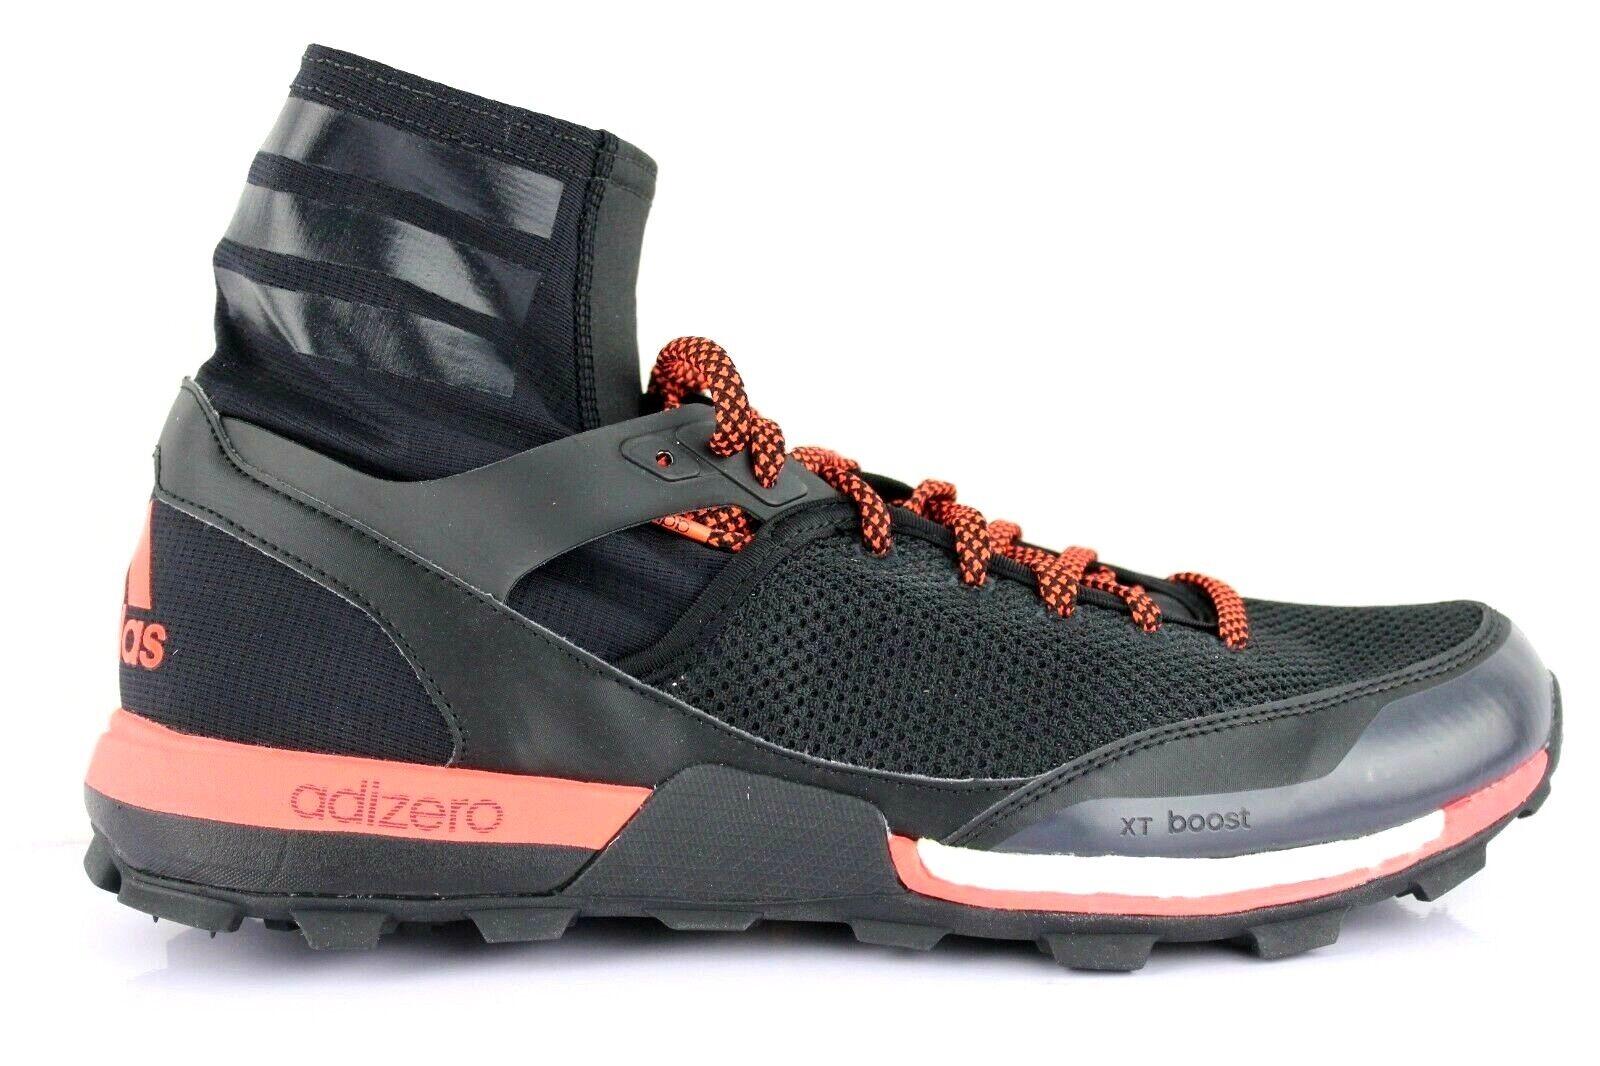 Adidas Adizero Boost M B23452 Schuhe Training Turnschuhe Laufschuhe Gr. wählbar